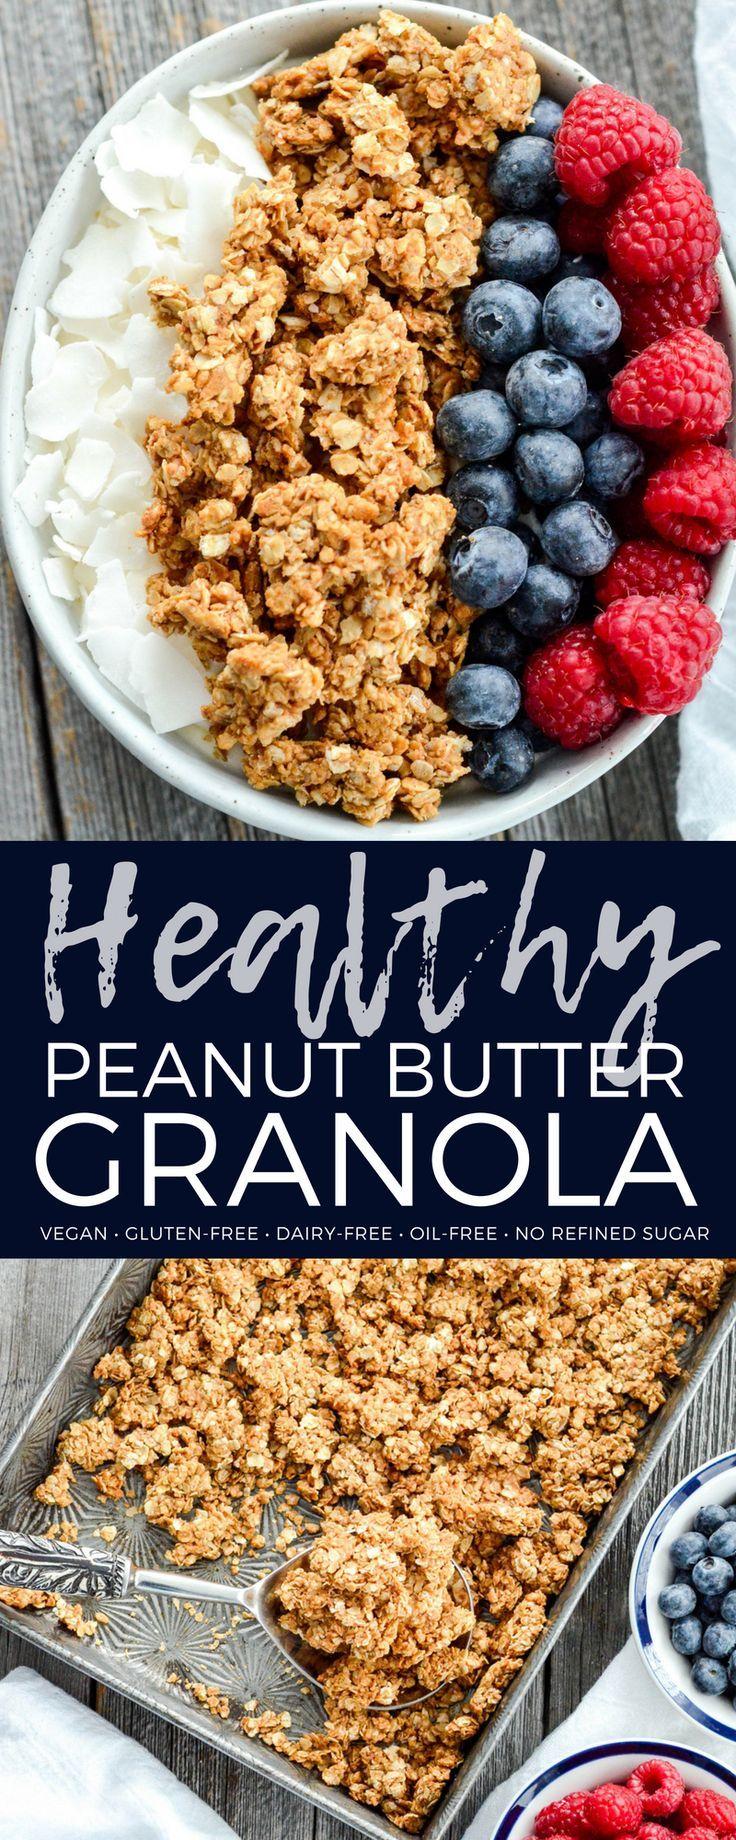 This Healthy Peanut Butter Granola is the perfect make-ahead breakfast recipe! W...   - gesundes Frühstück -